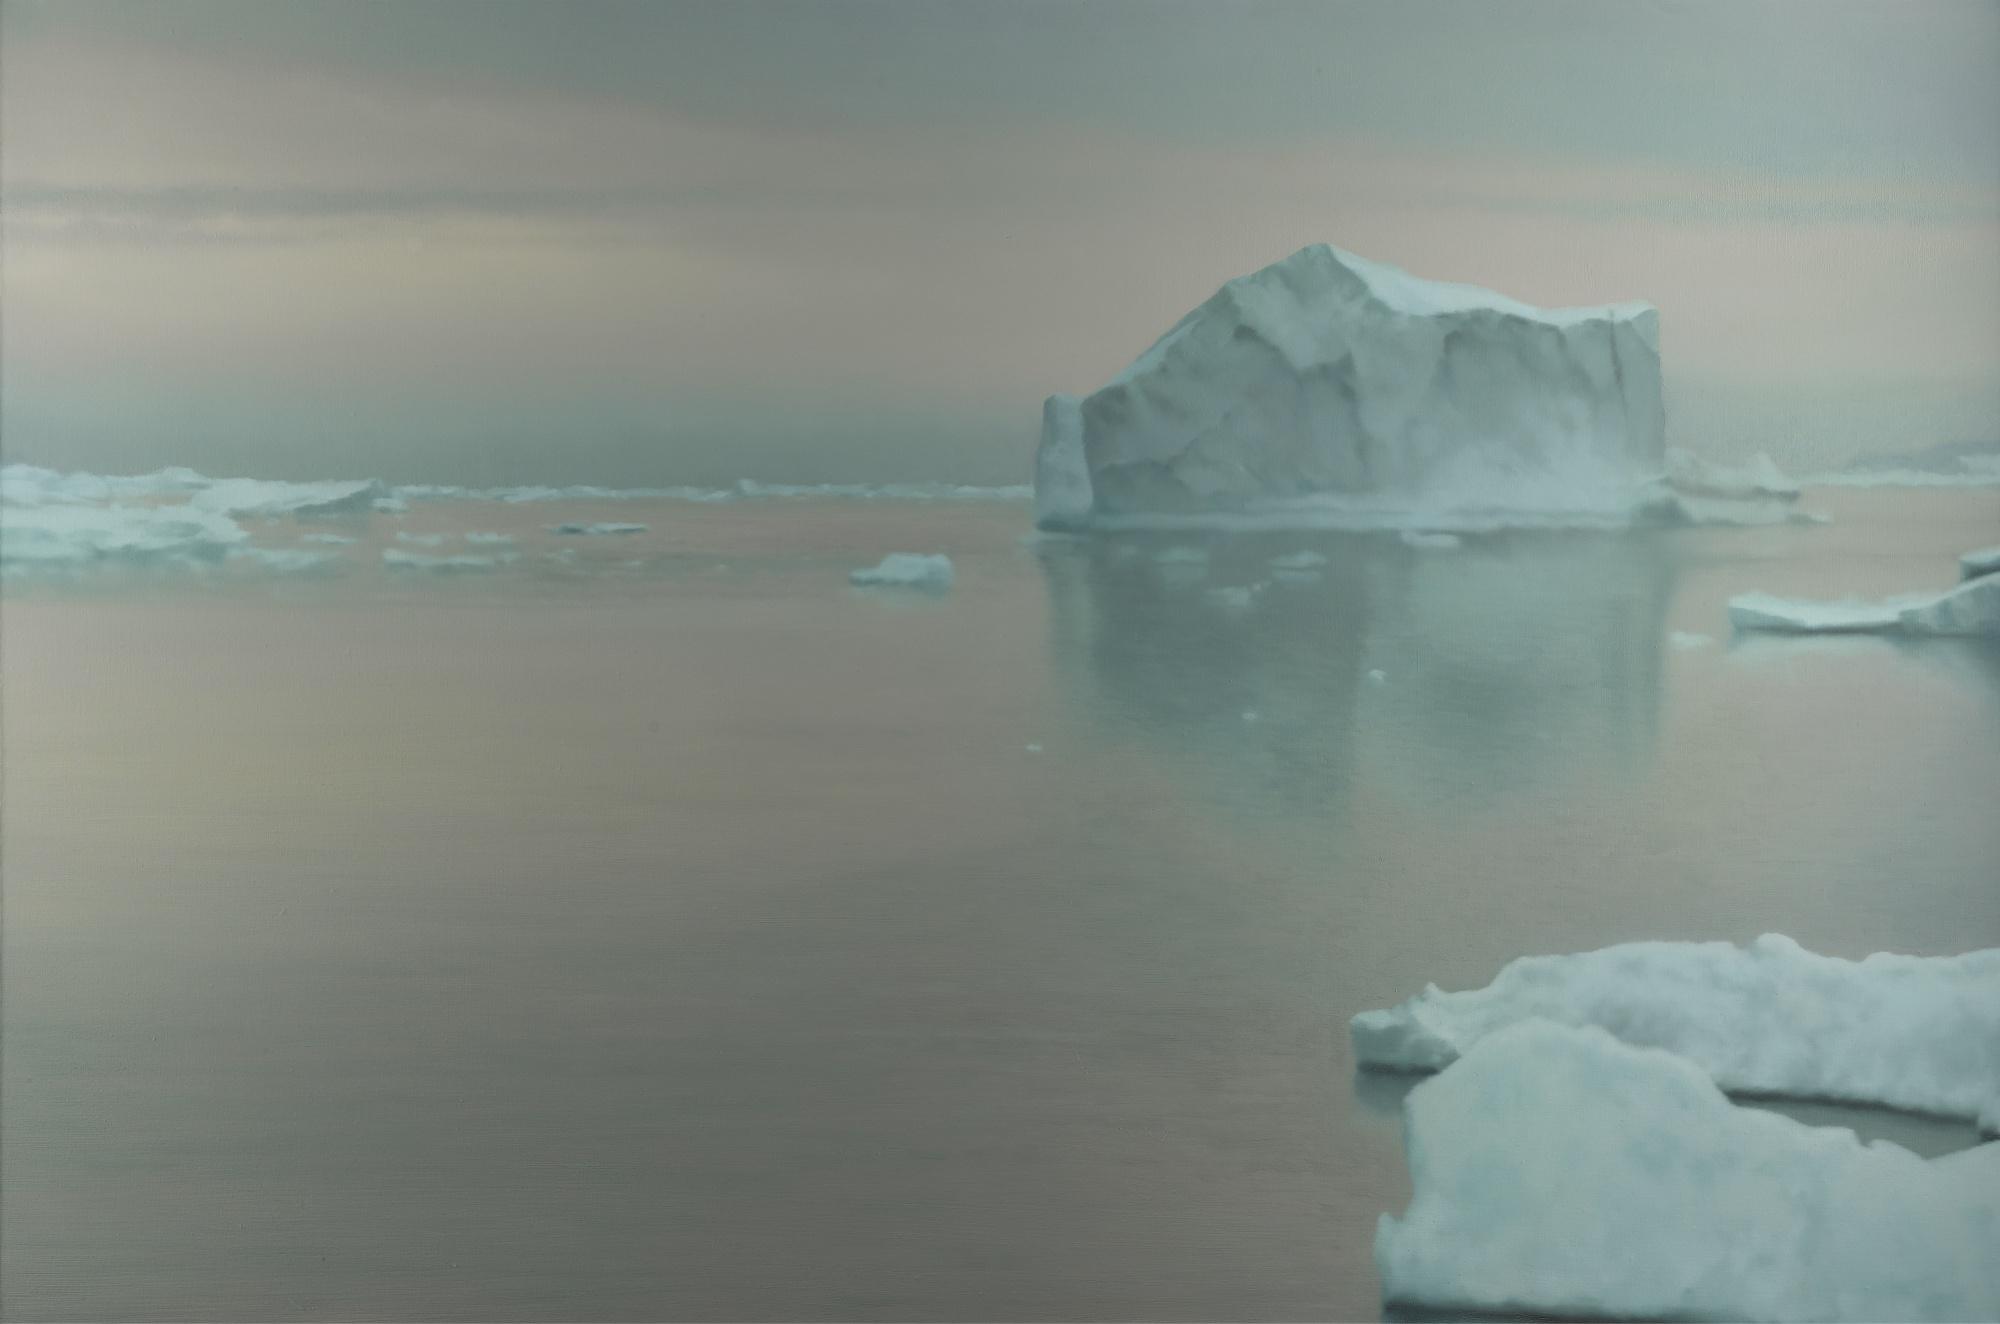 17,7 milioni£ per Eisberg di Richter da Sotheby's. Totale 118,015,150 sterline